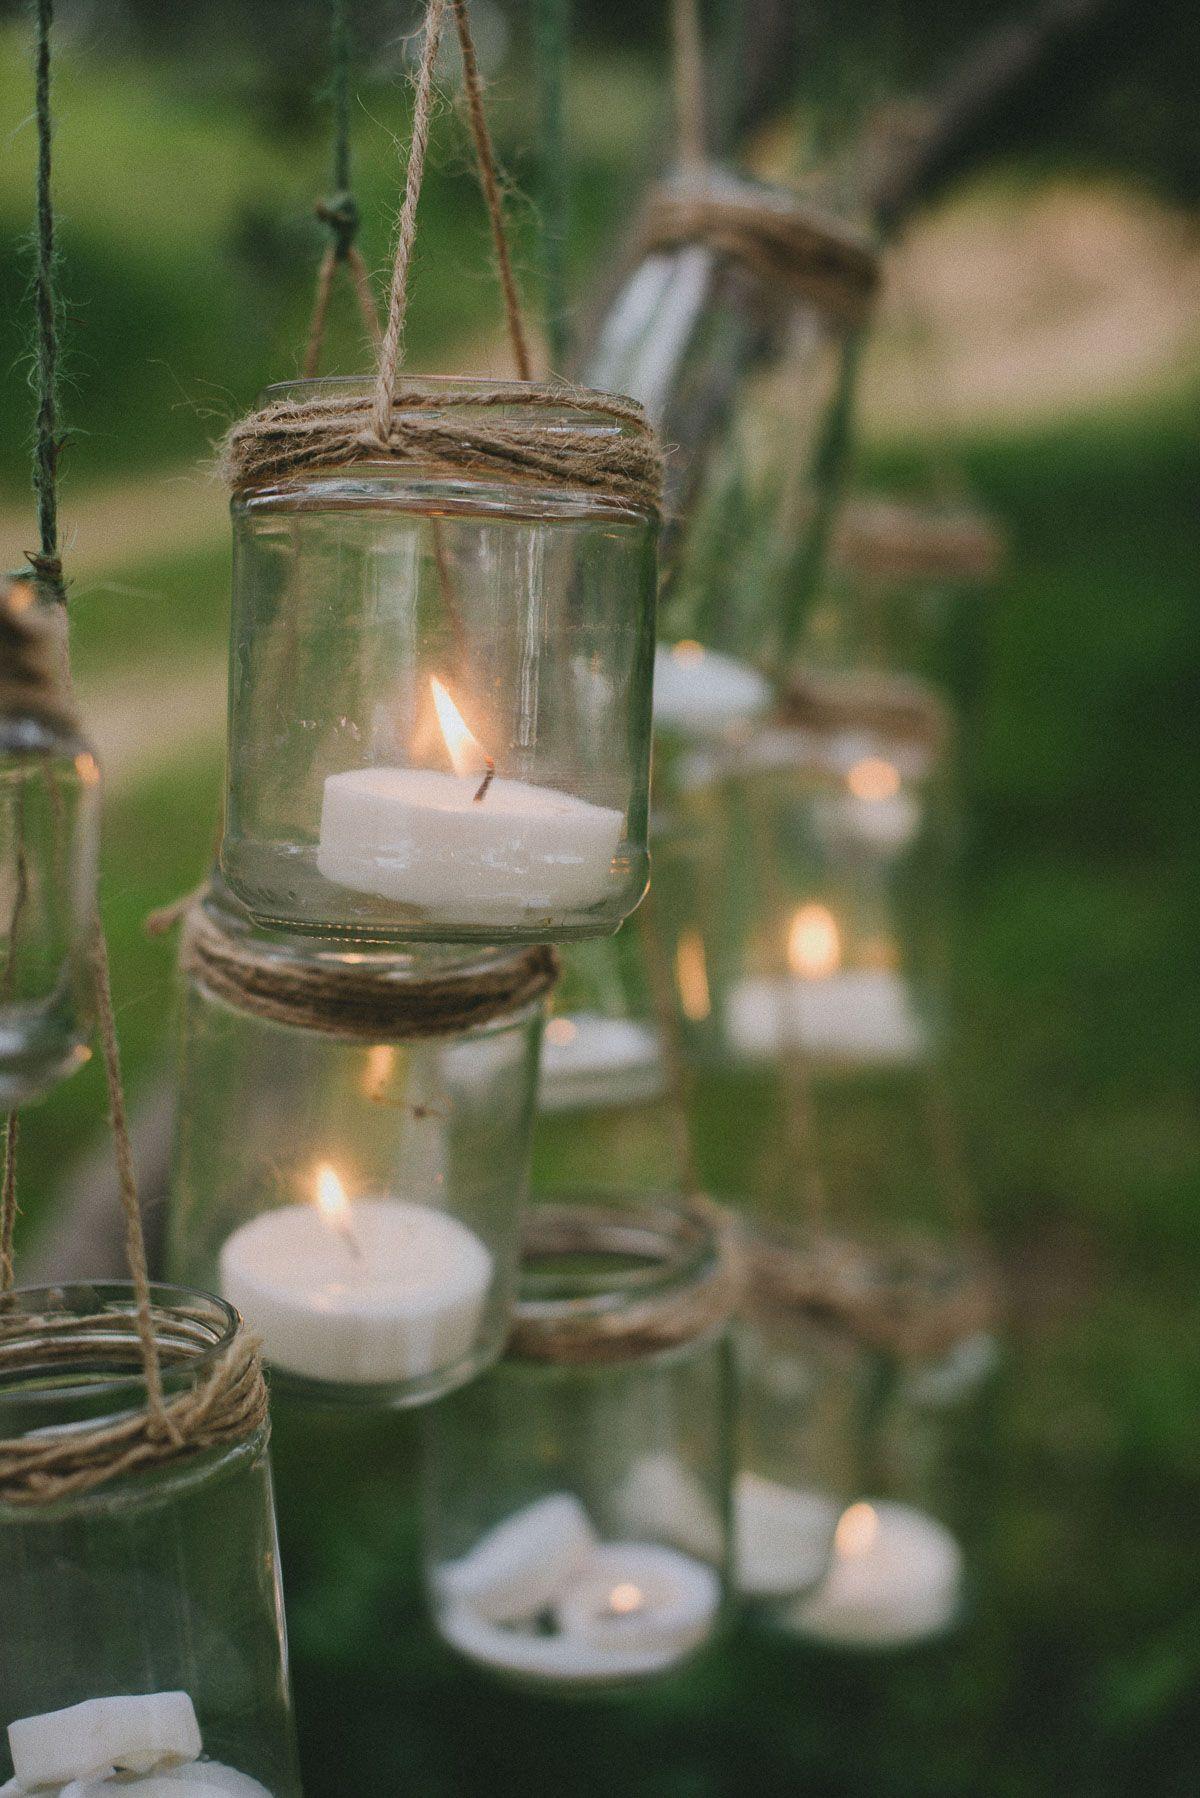 Detalle decoraci n cristal con velas inspiraci n boda mediterr nea pinterest boda - Farolillos para velas ...